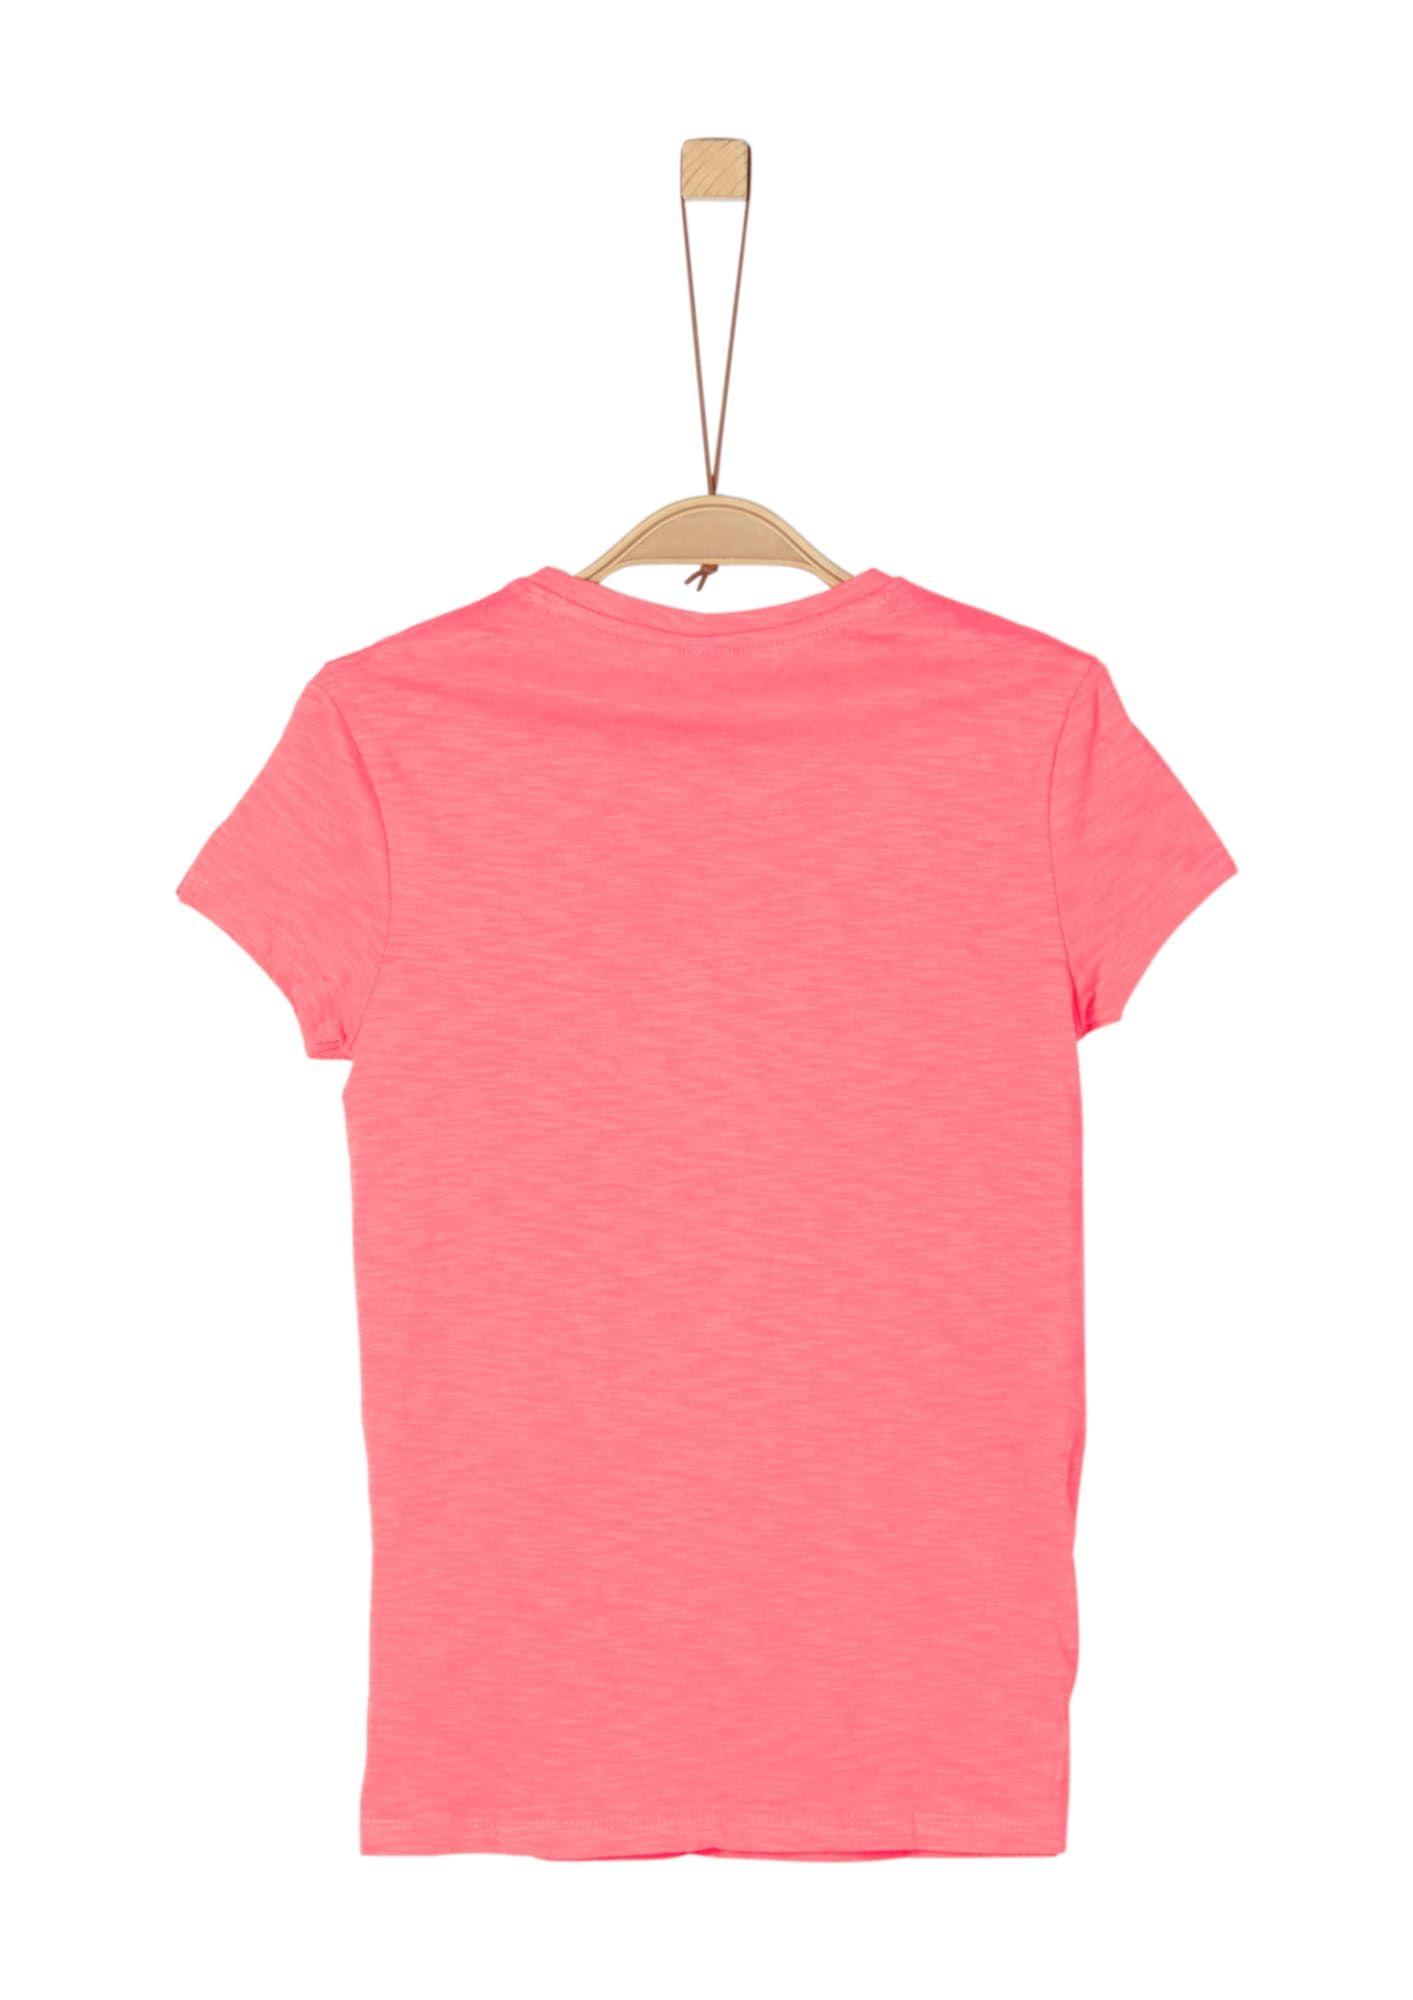 S Oliver Junior Shirt Madchen Gelb Grun Melone Grosse L Frauen T Shirts Shirts Madchen